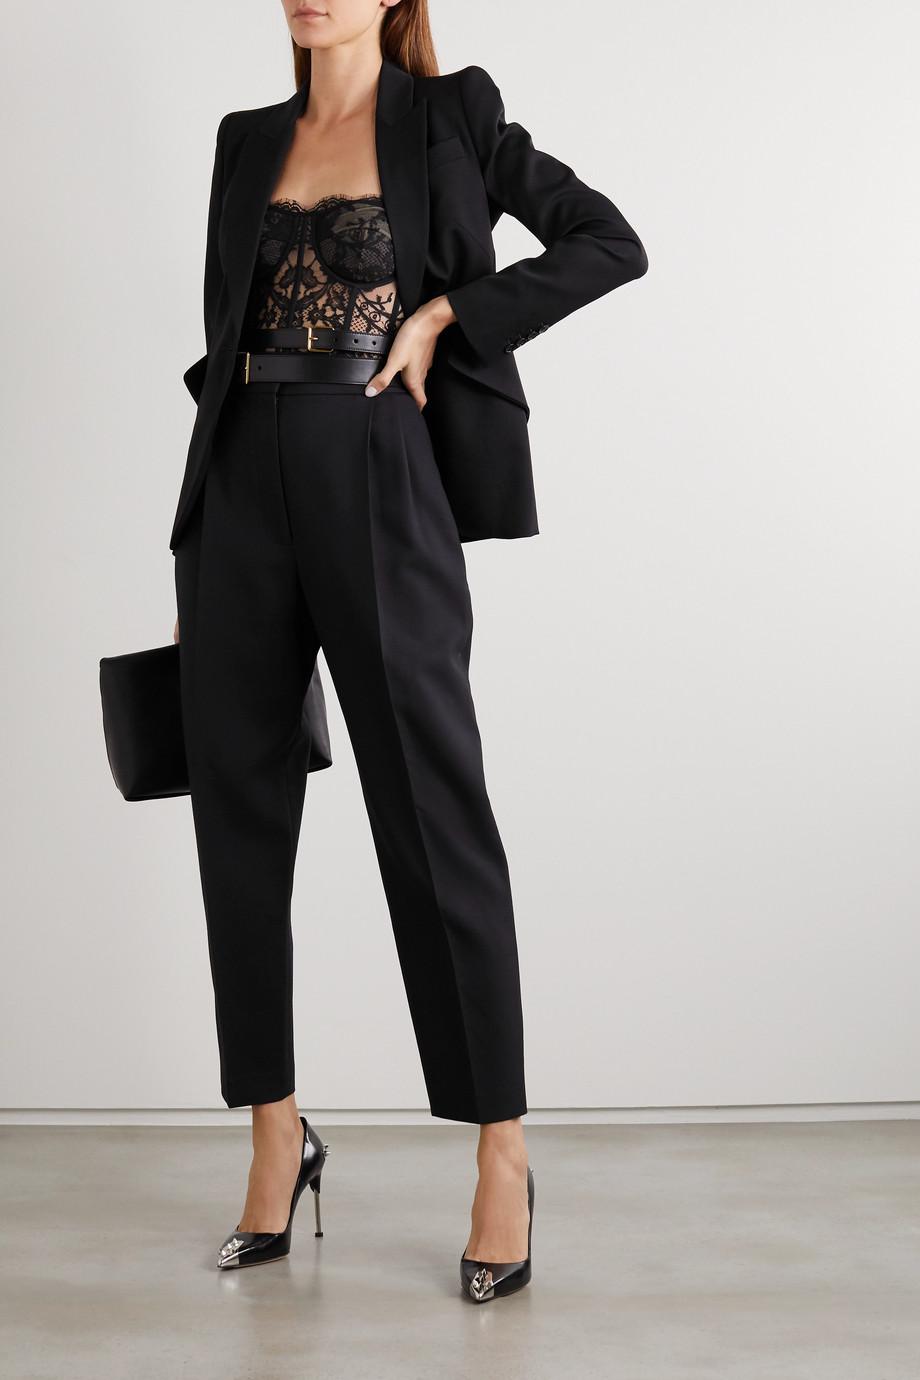 Alexander McQueen Cotton-blend lace bustier top